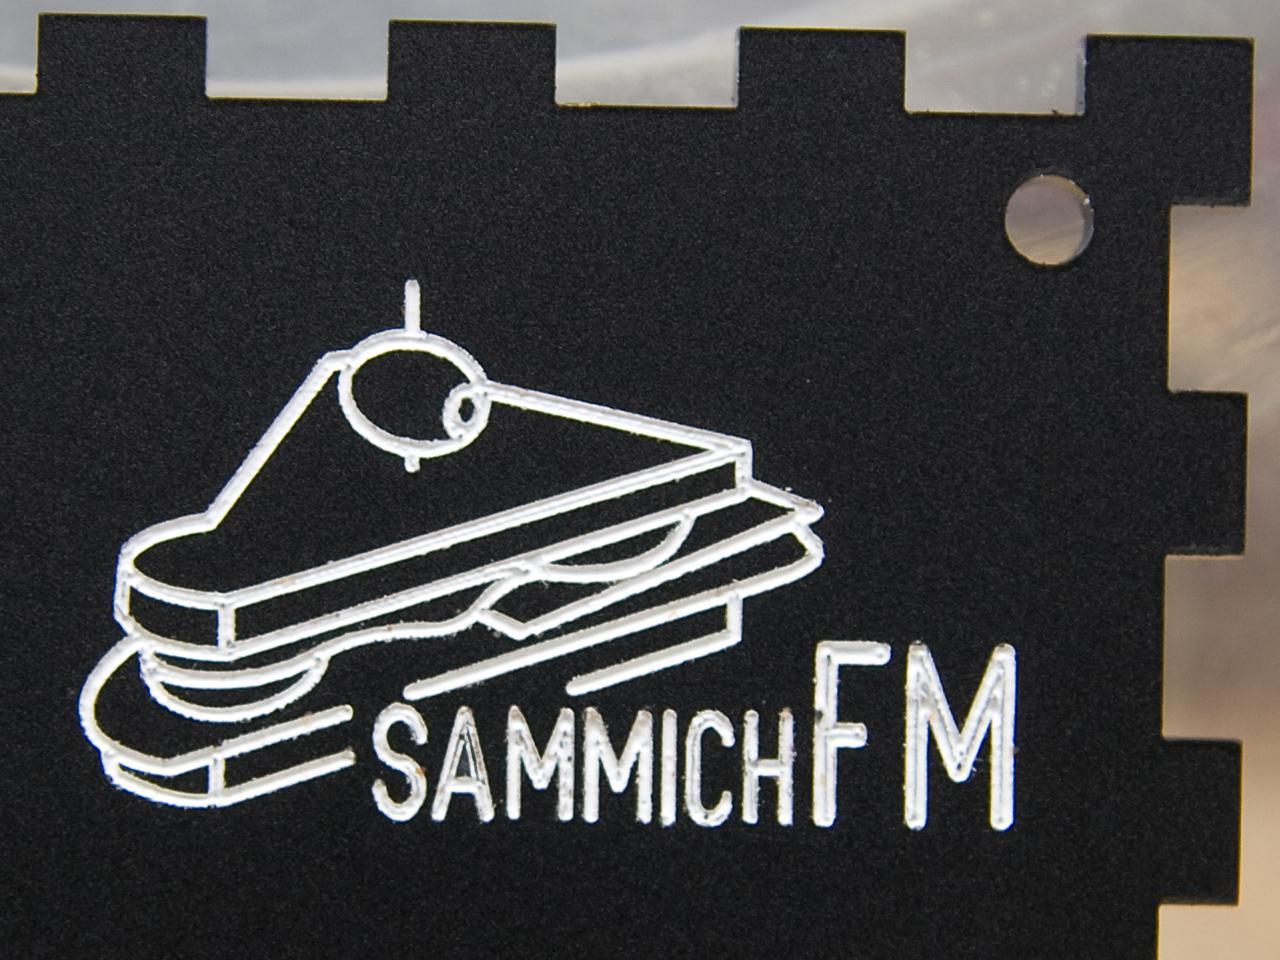 sammichFM enamel paint fill demo